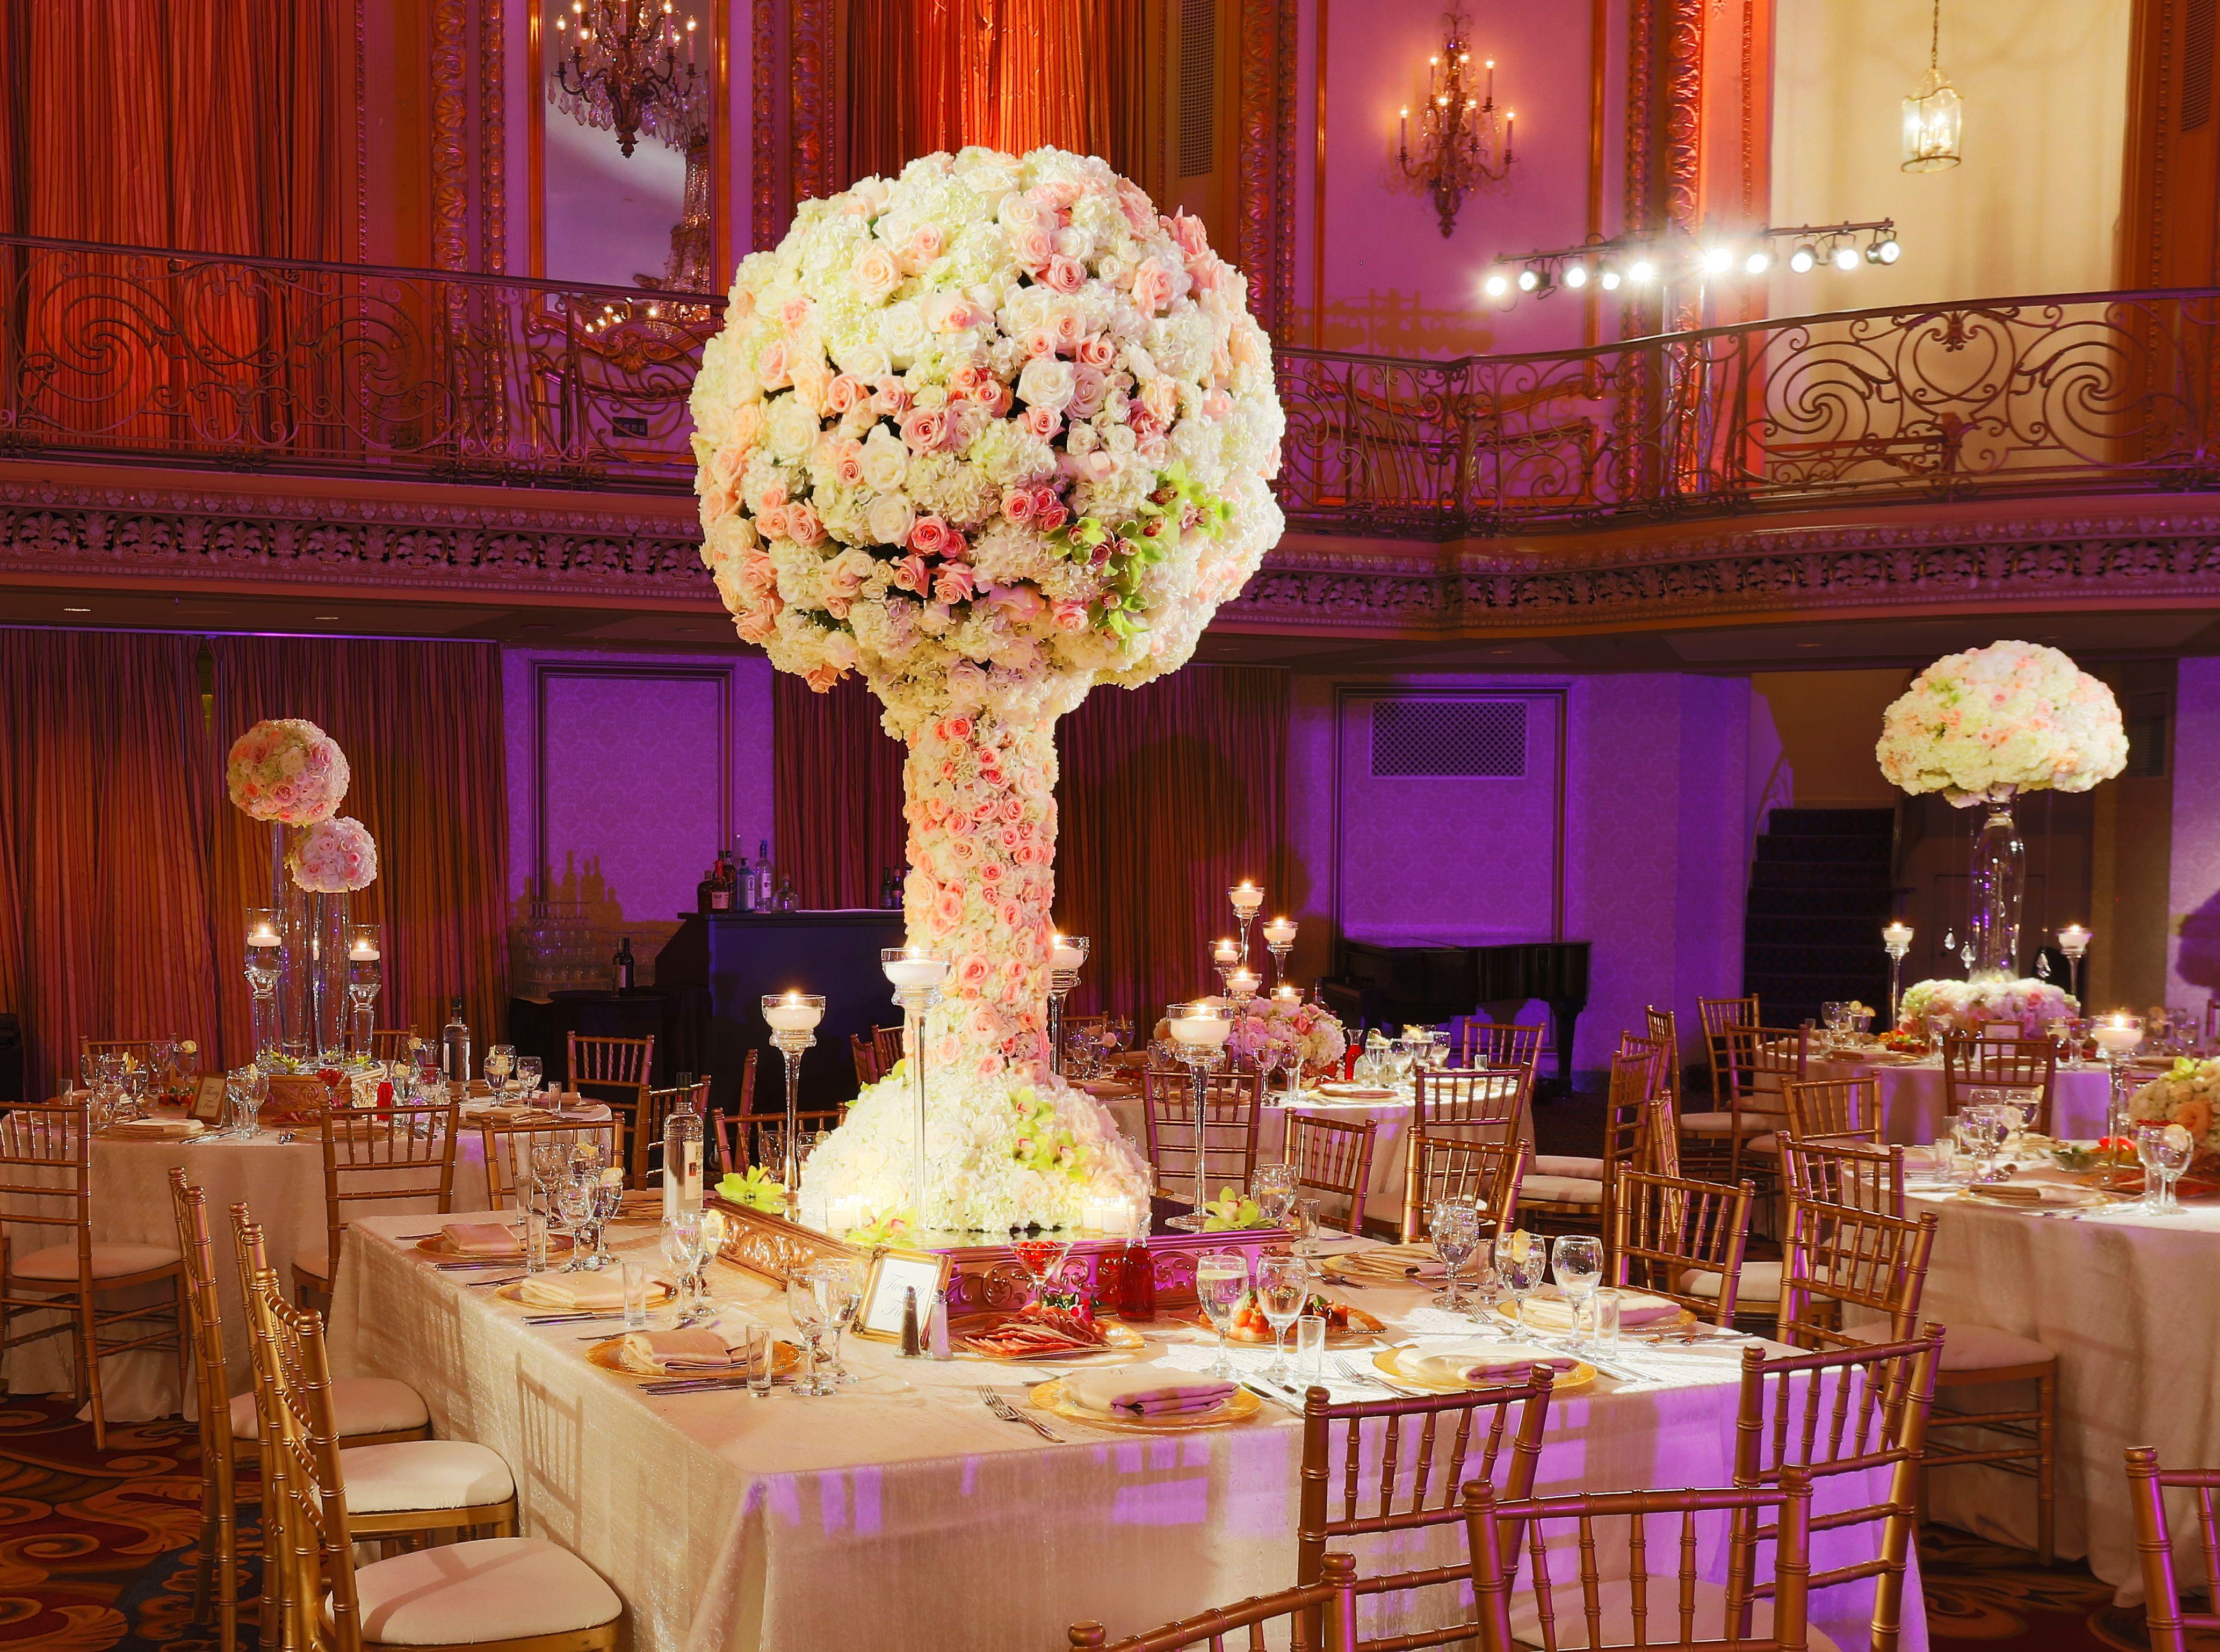 Hilton Chicago Oak Brook Hills Resort And Conference Center Wedding Centerpieces Indian Wedding Reception Indian Wedding Ceremony